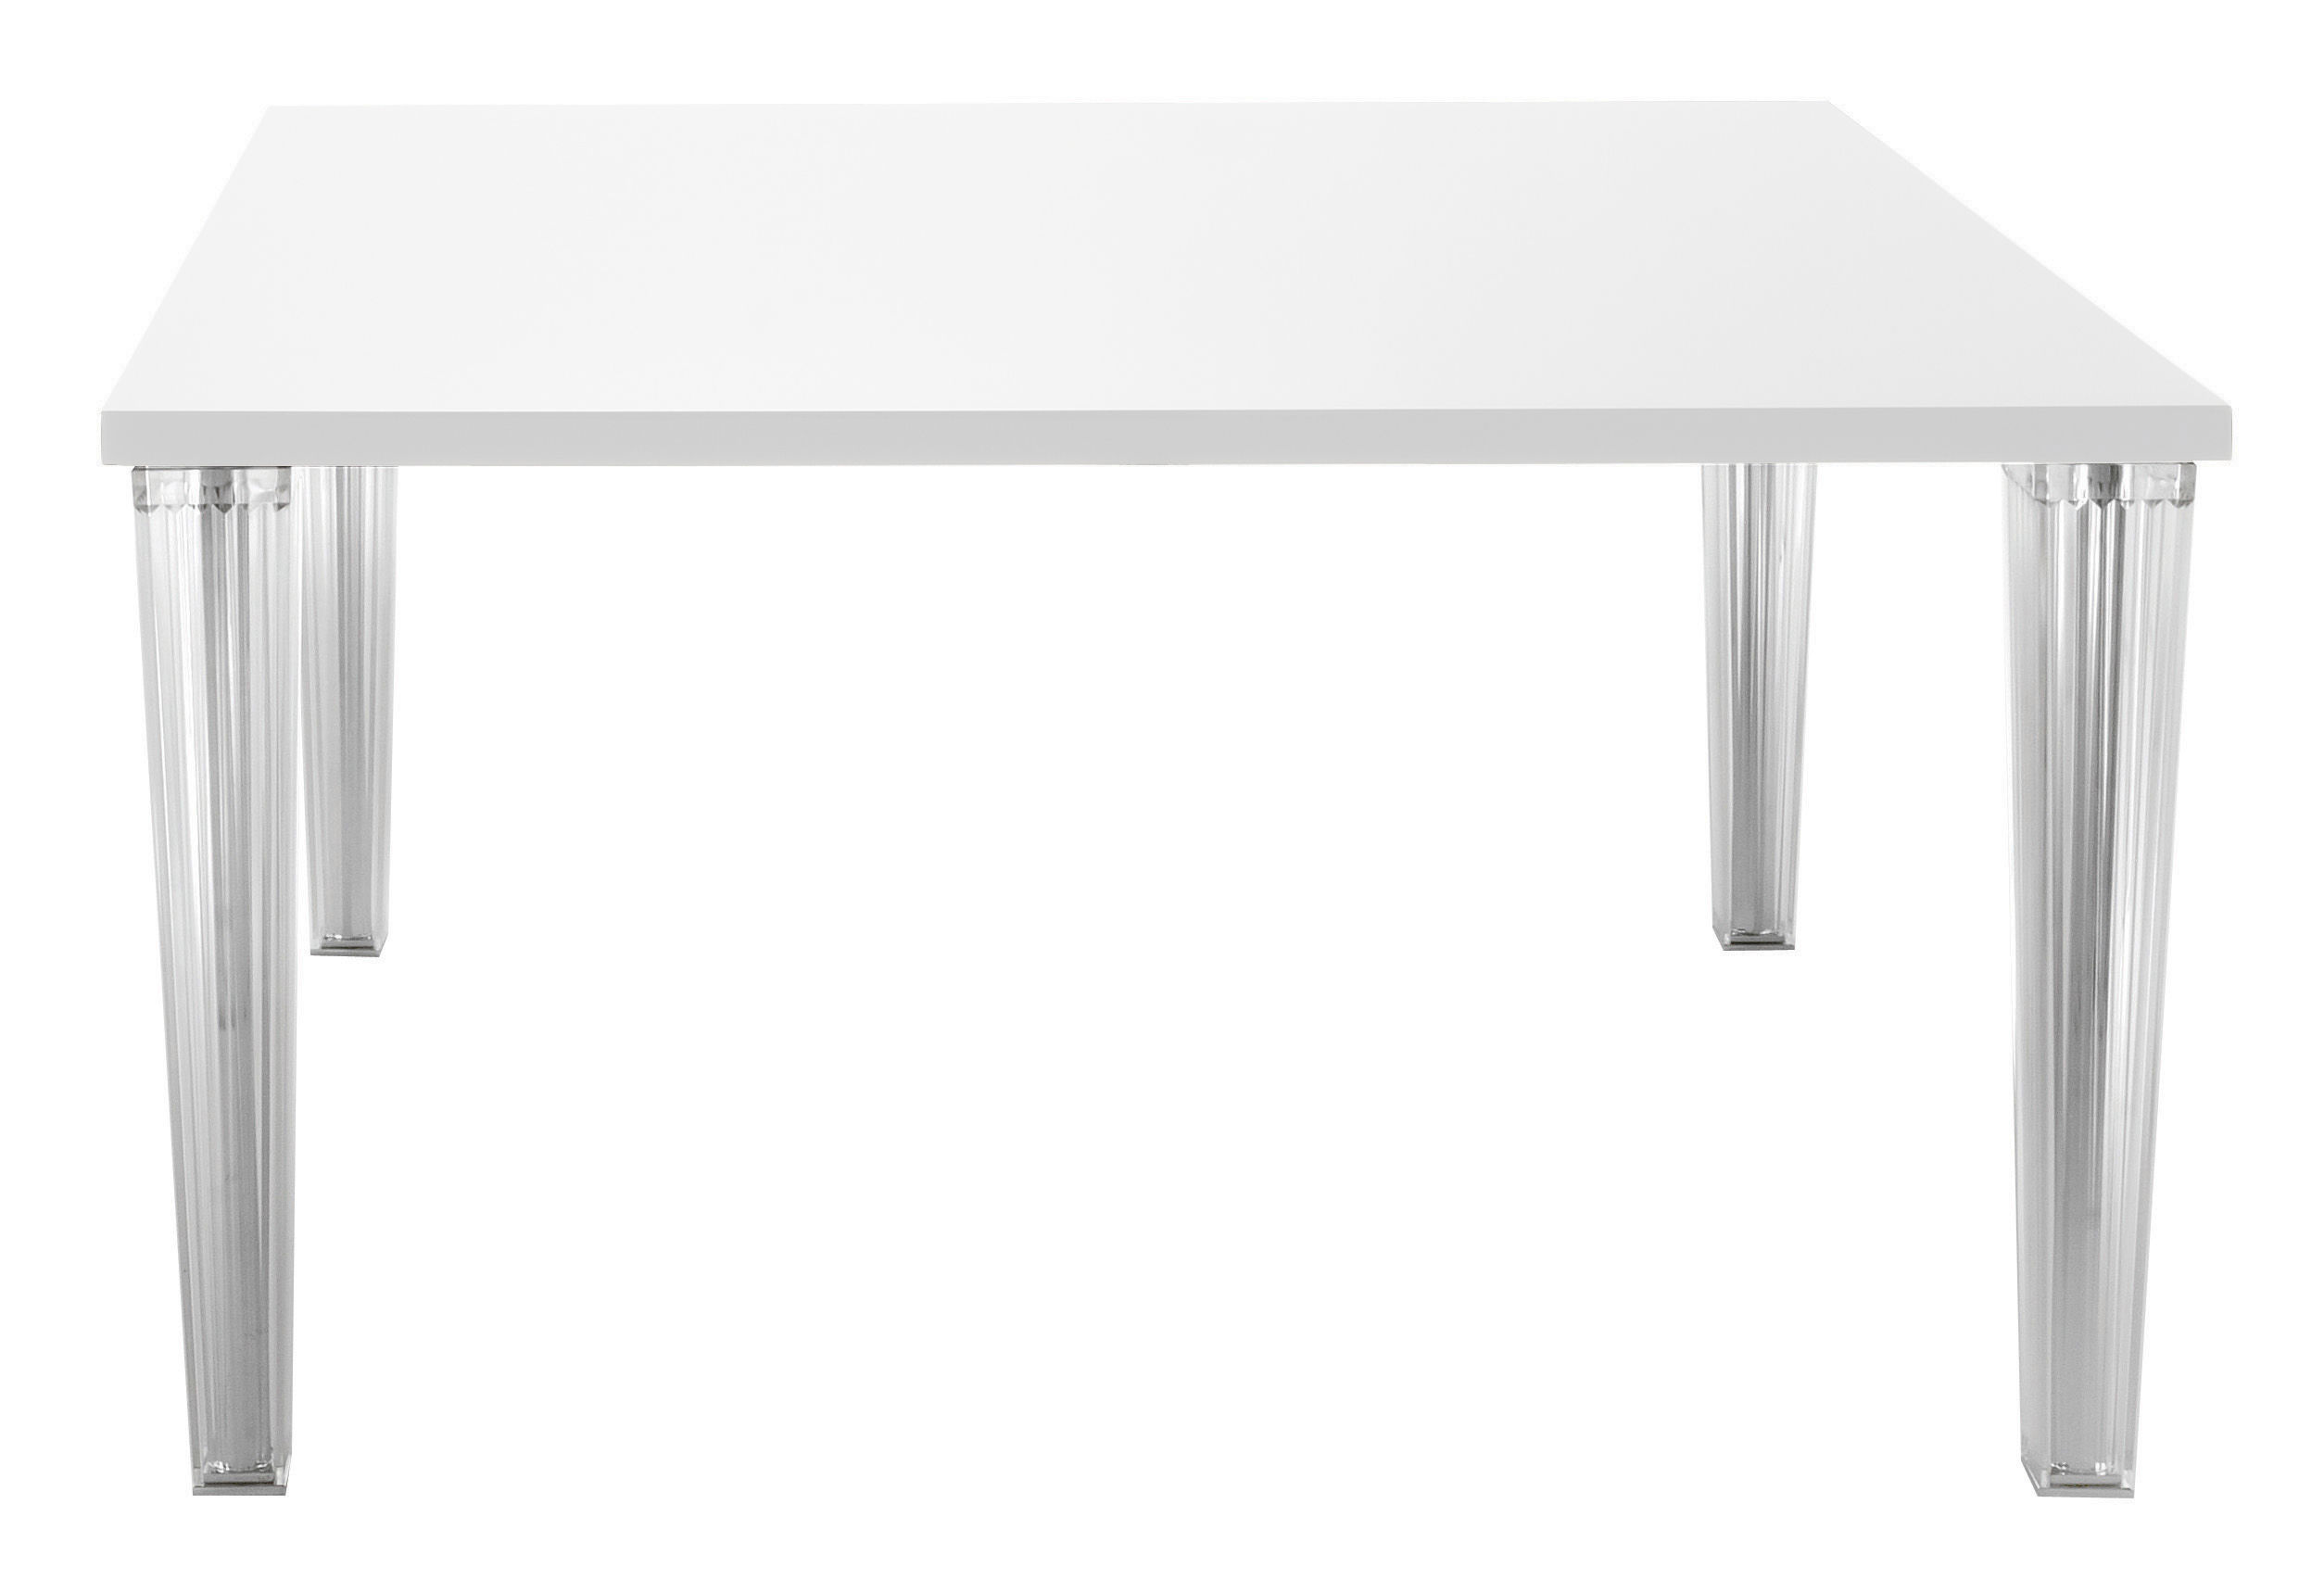 Mobilier - Tables - Table carrée Top Top / Laquée - 130 x 130 cm - Kartell - Blanc - Polycarbonate, Polyester laqué